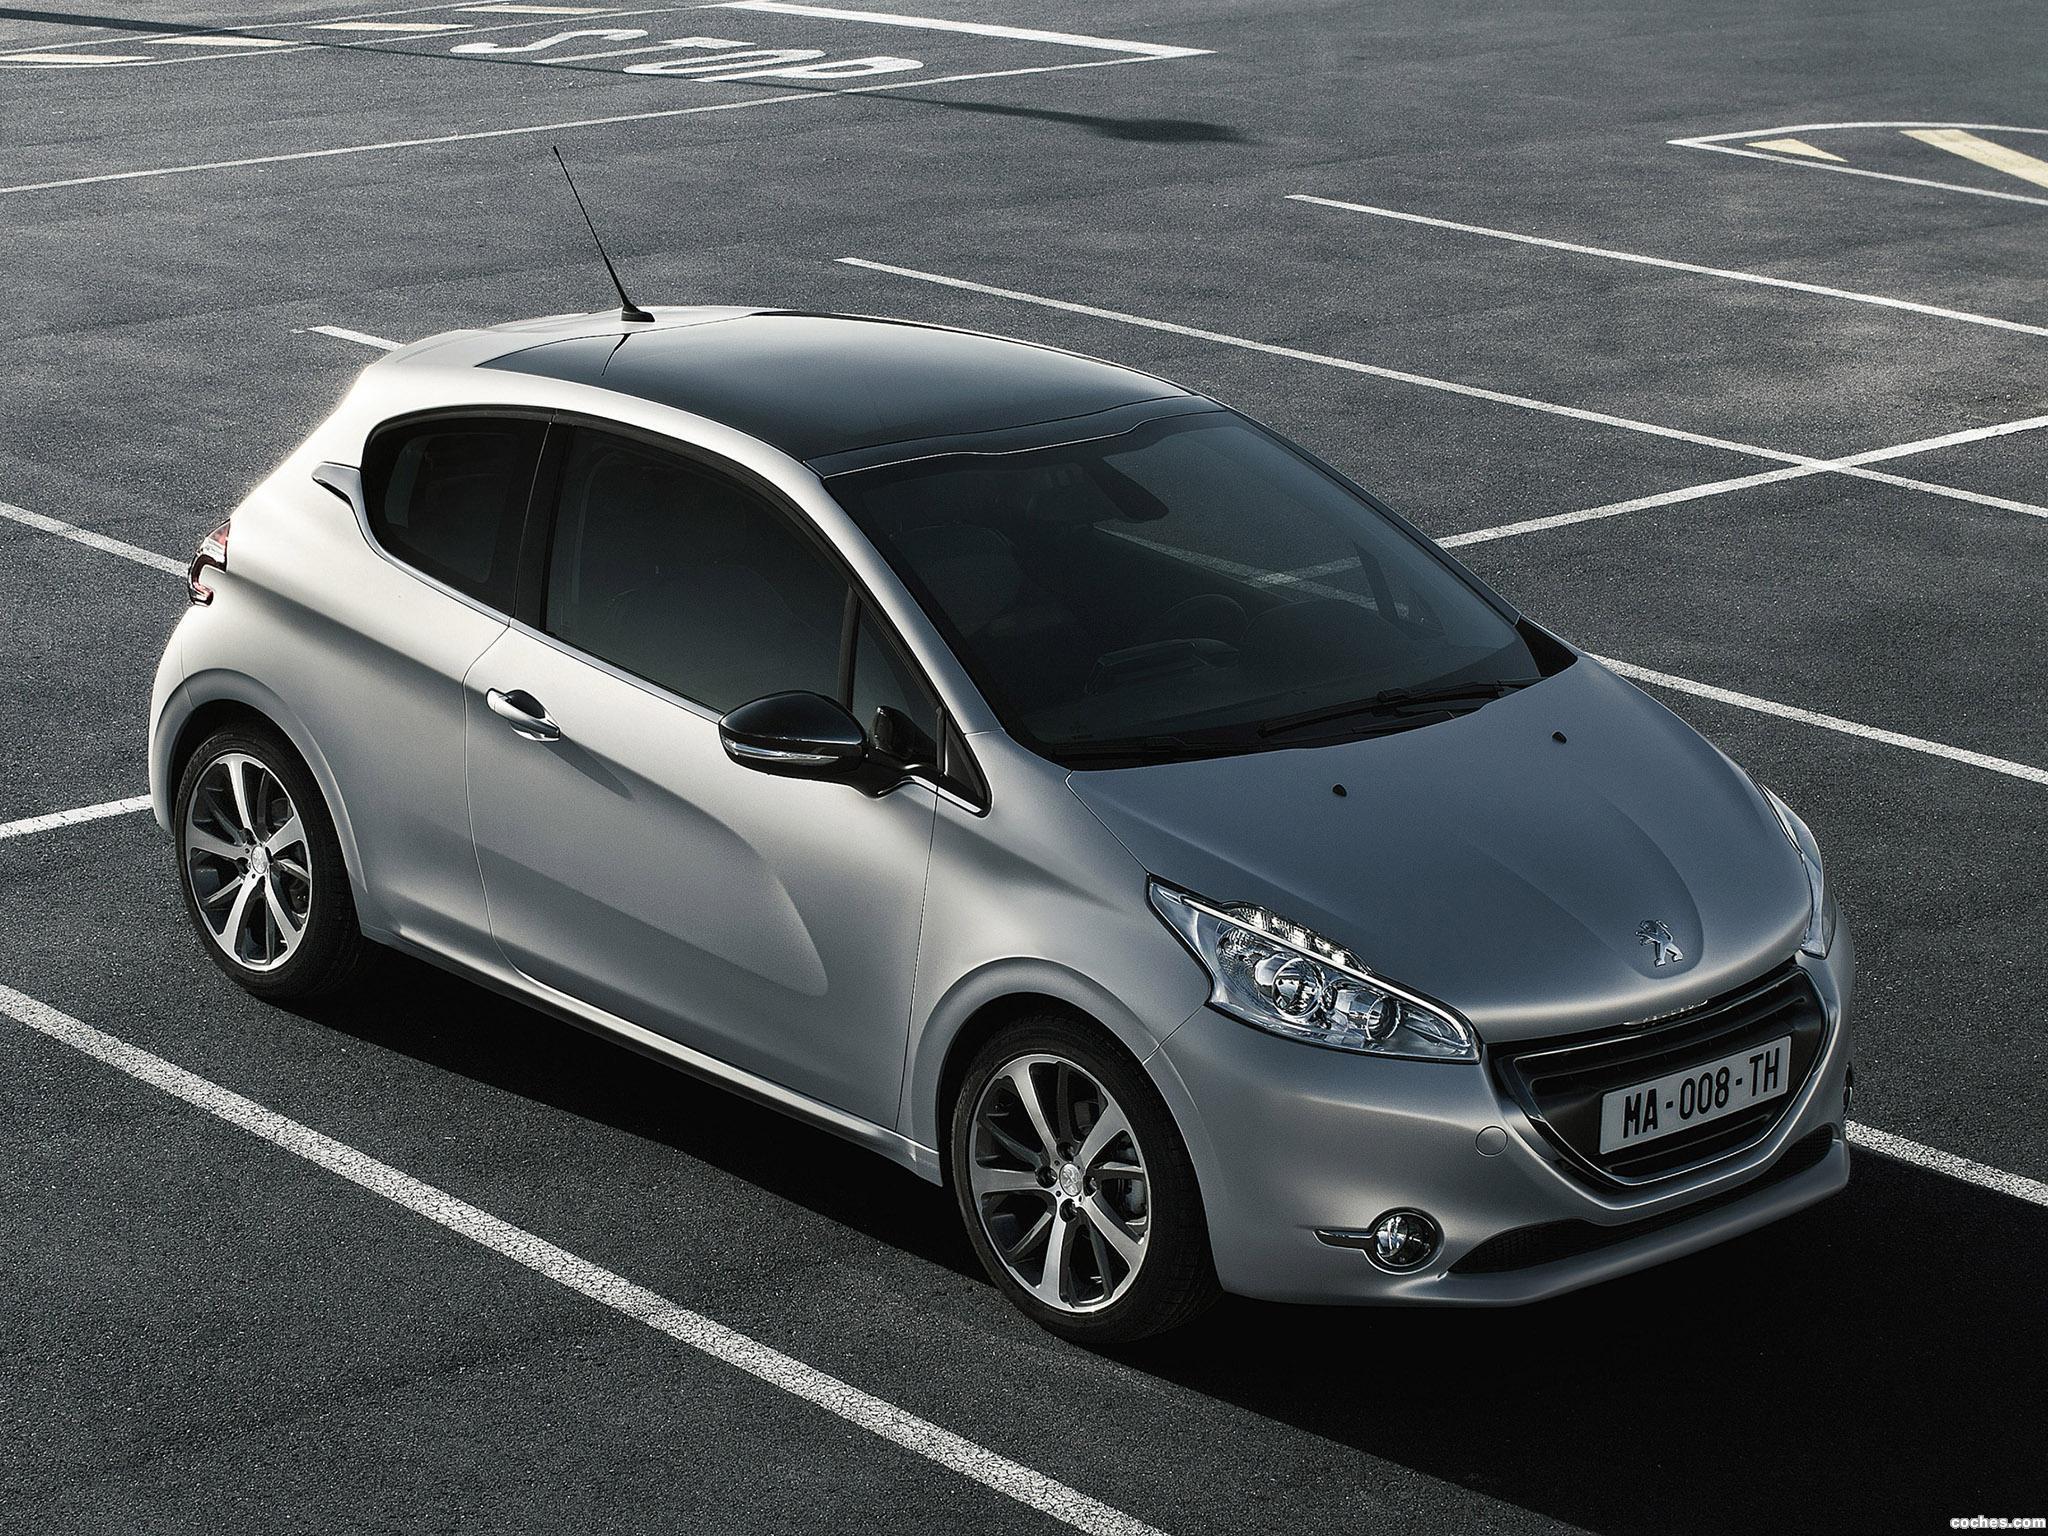 Foto 0 de Peugeot 208 3 puertas 2012